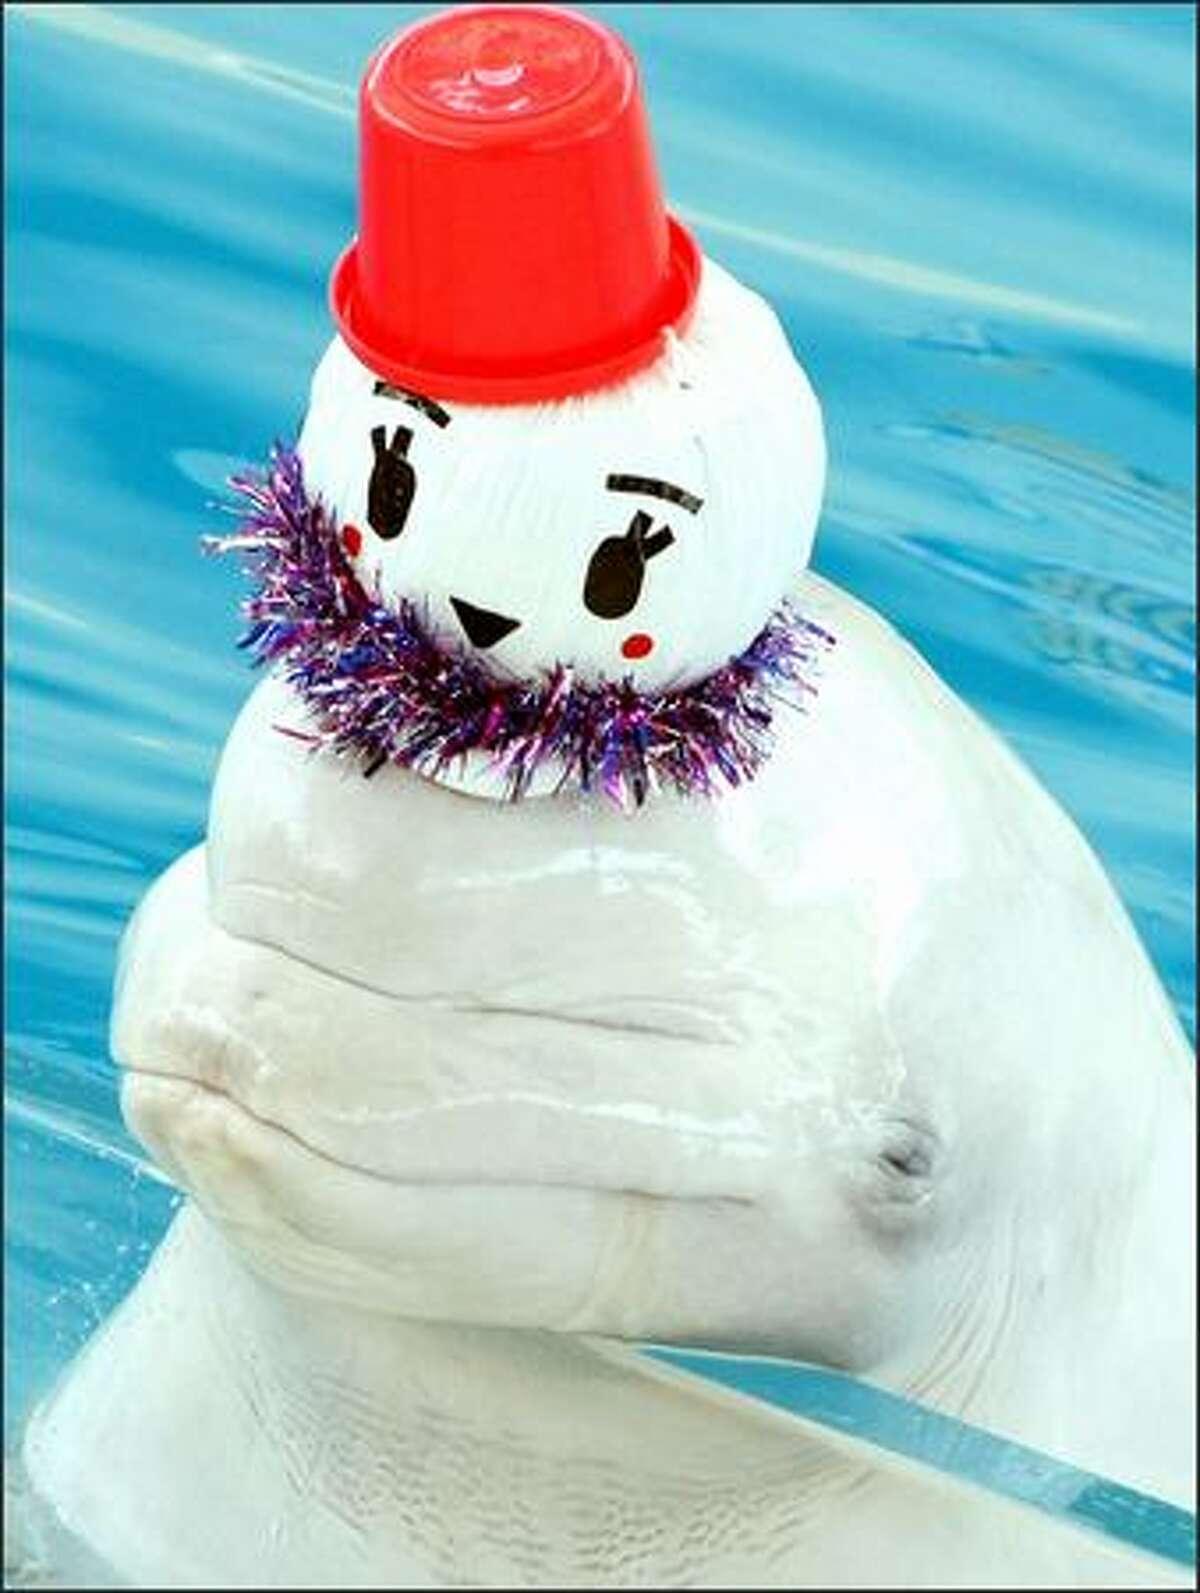 A white Beluga whale wears a snowman themed Christmas hat at Yokohama Hakkeijima Sea Paradise in Yokohama, Kanagawa, Japan.